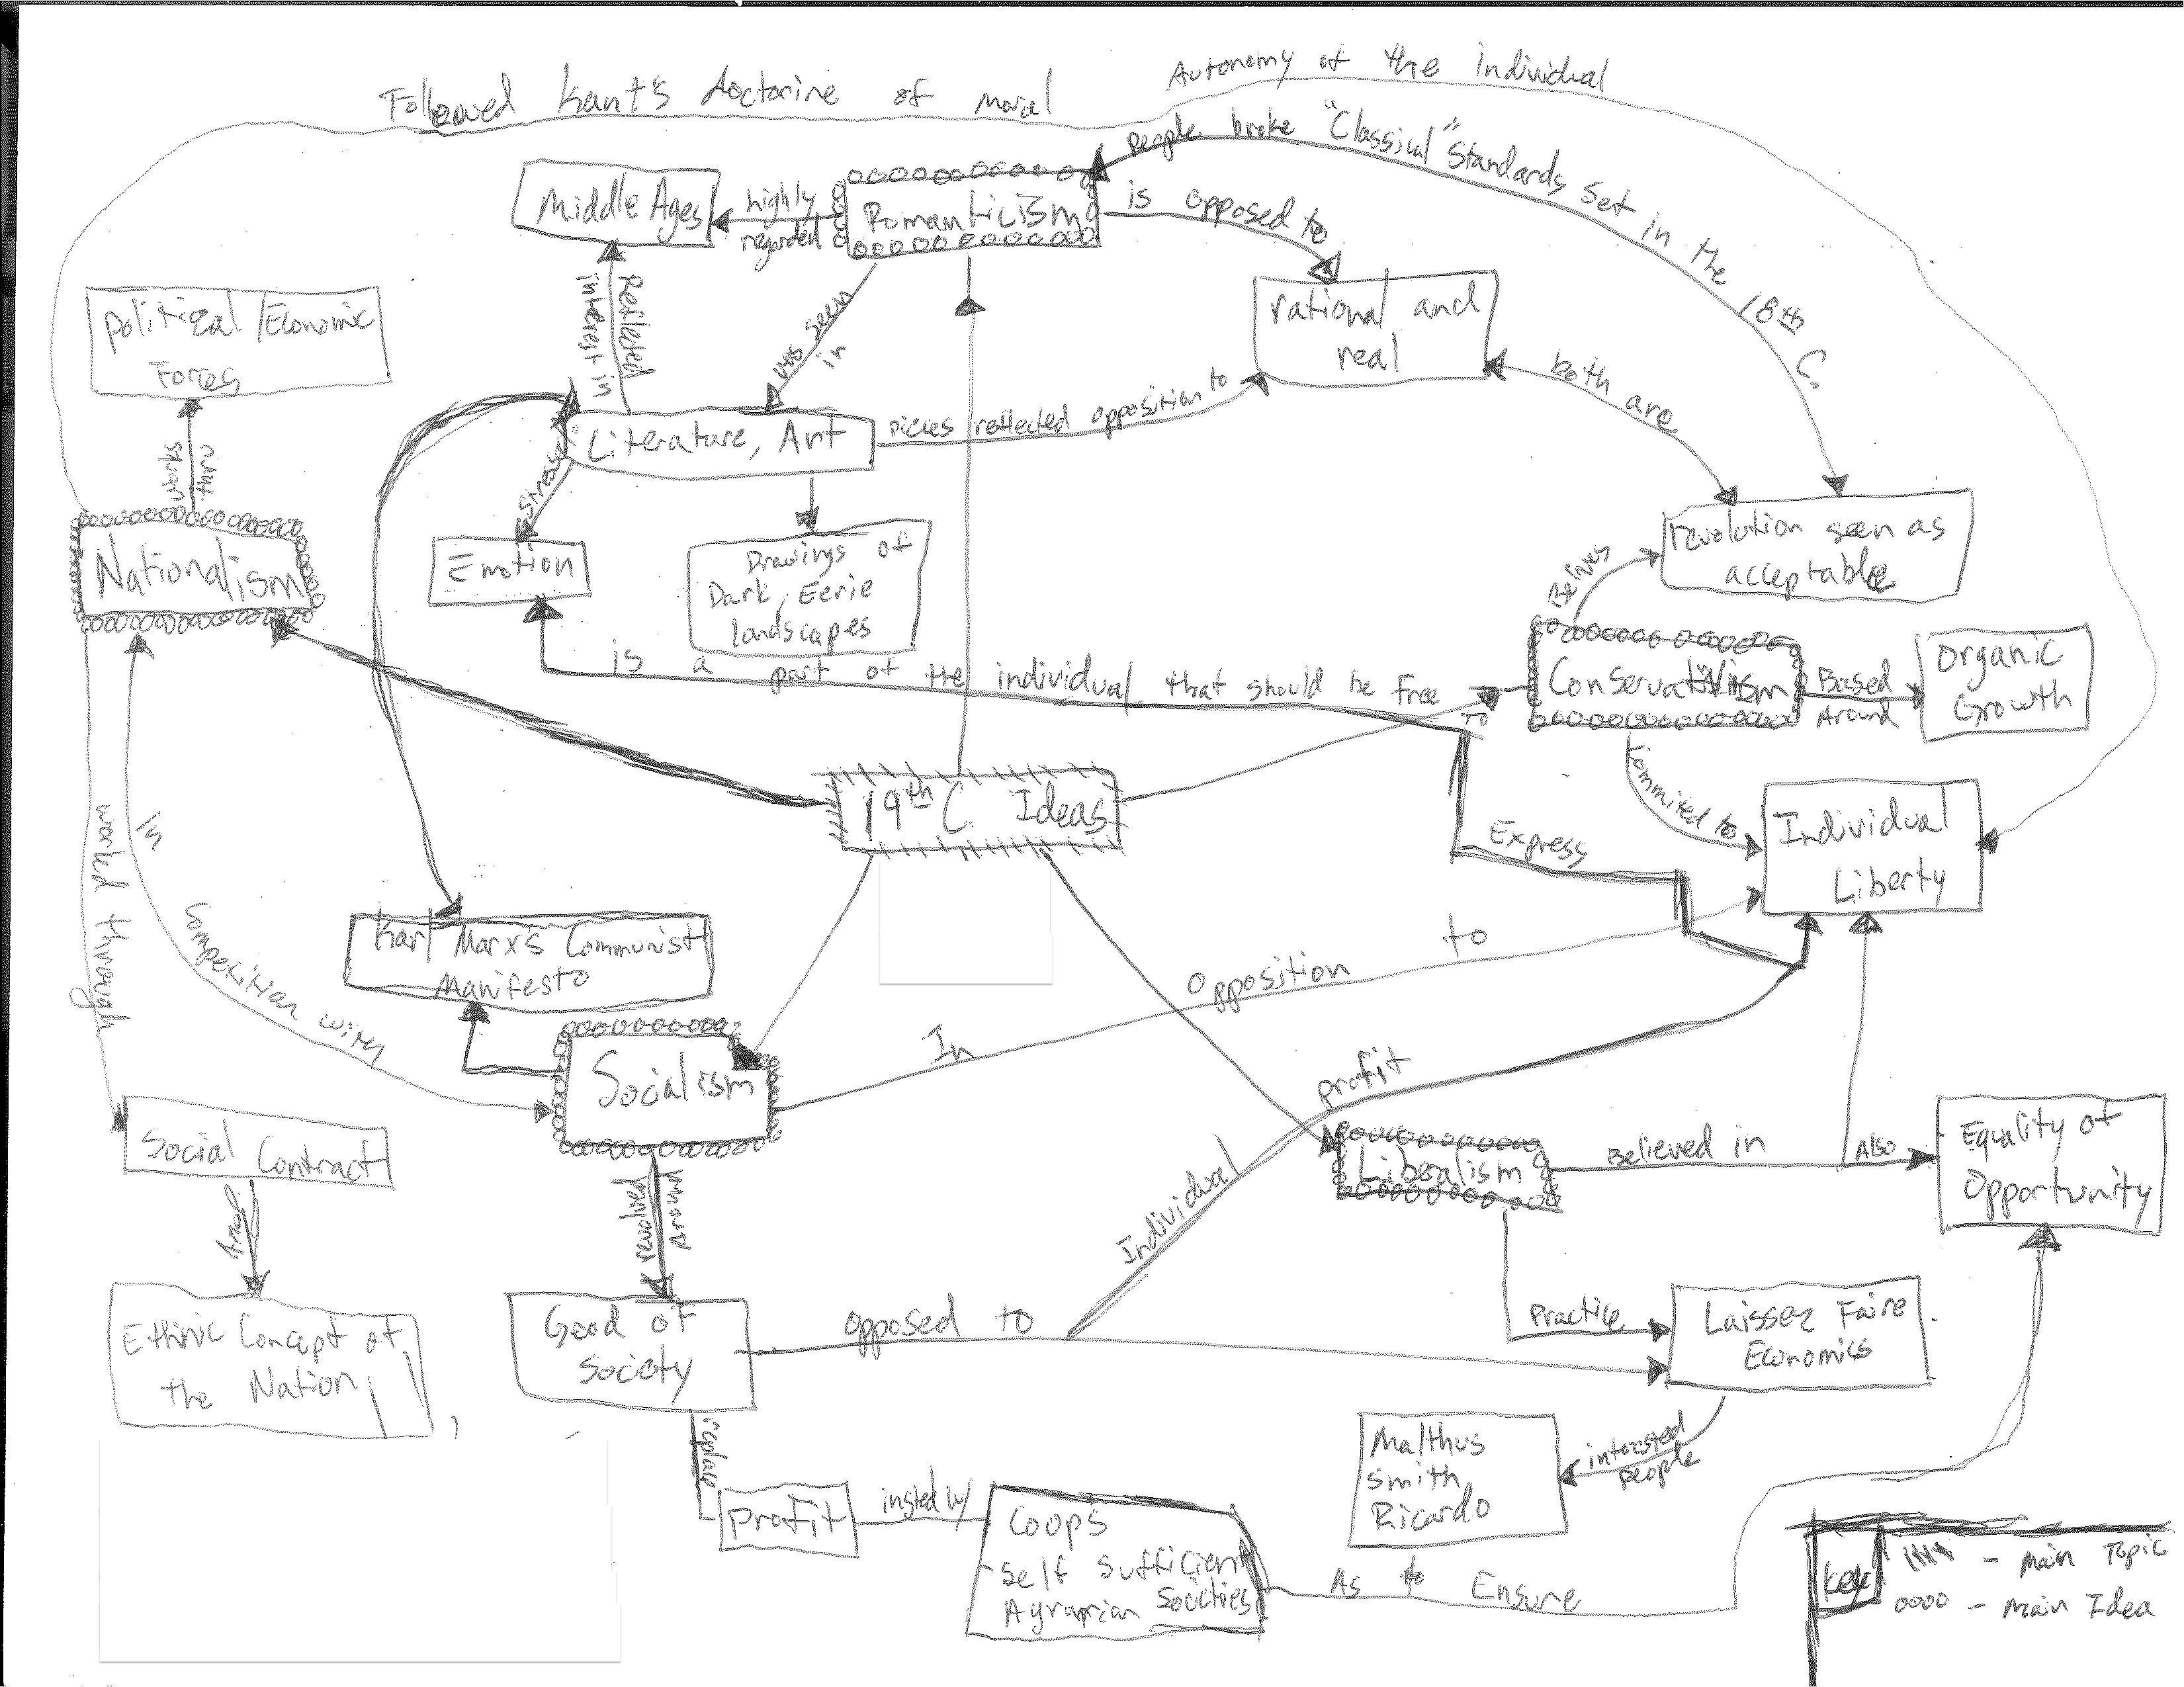 Columbian Exchange Blank Map Mind map 19th c. ideas